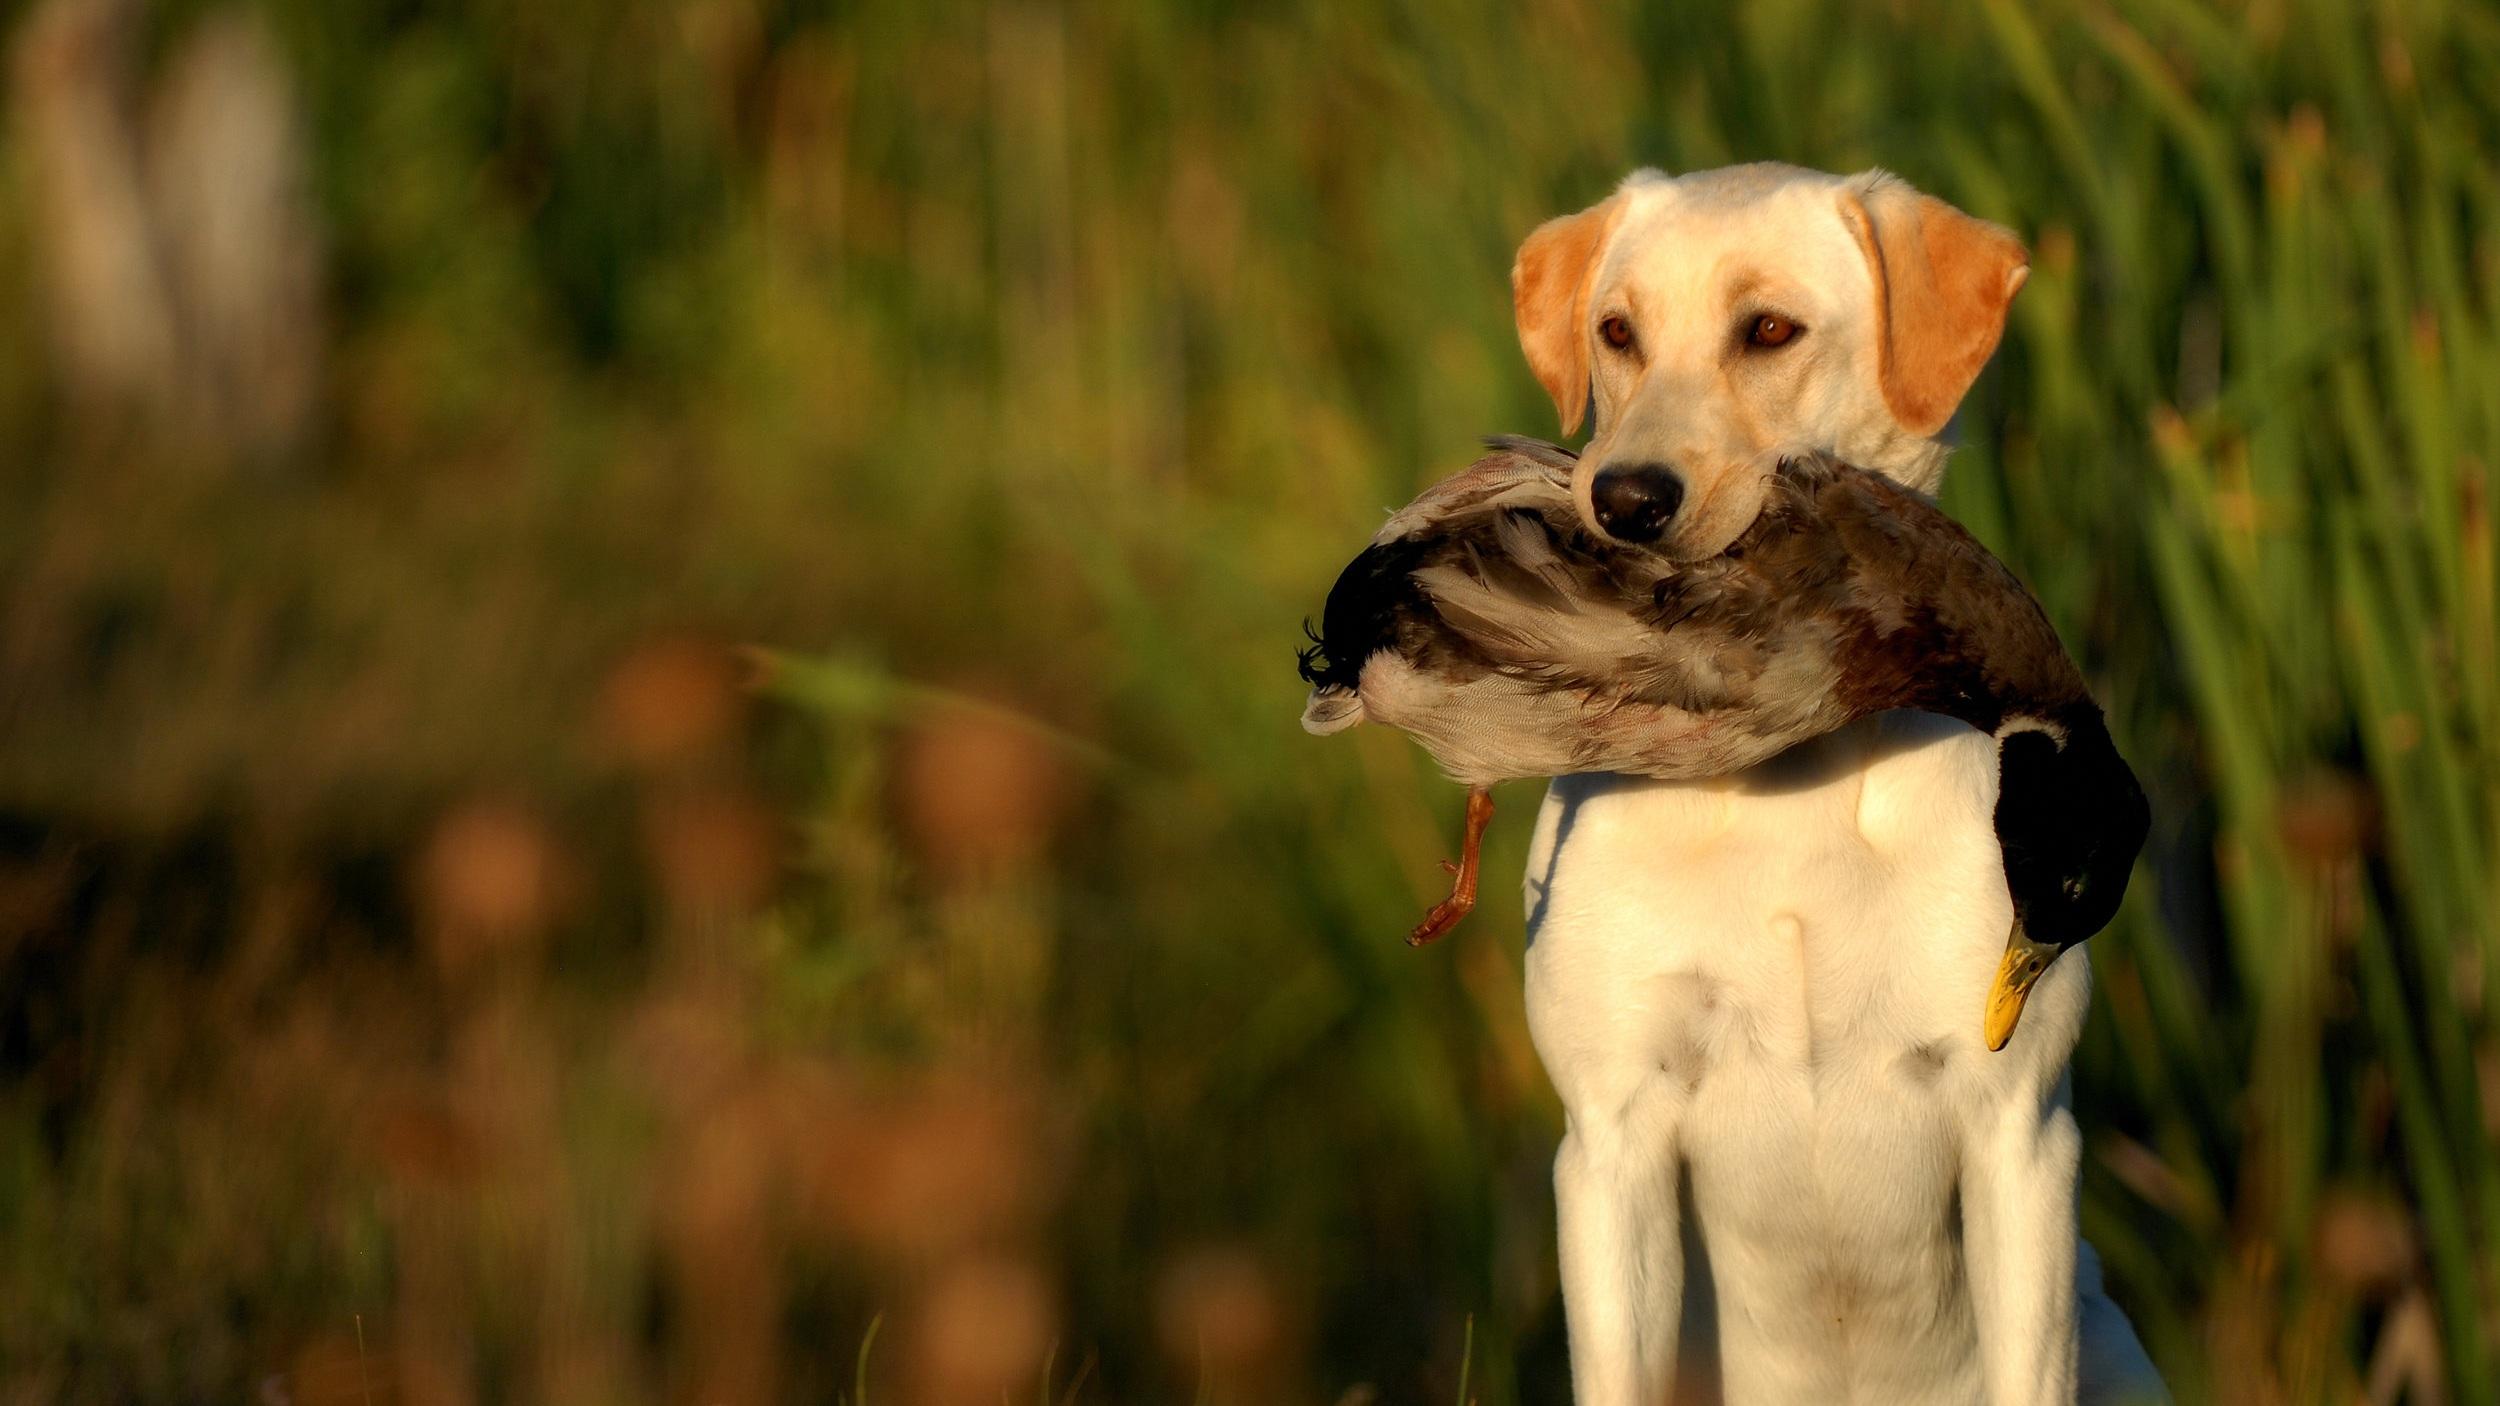 Yellow-Labrador-Retriever-Hunting-477849979_3872x2592.jpg